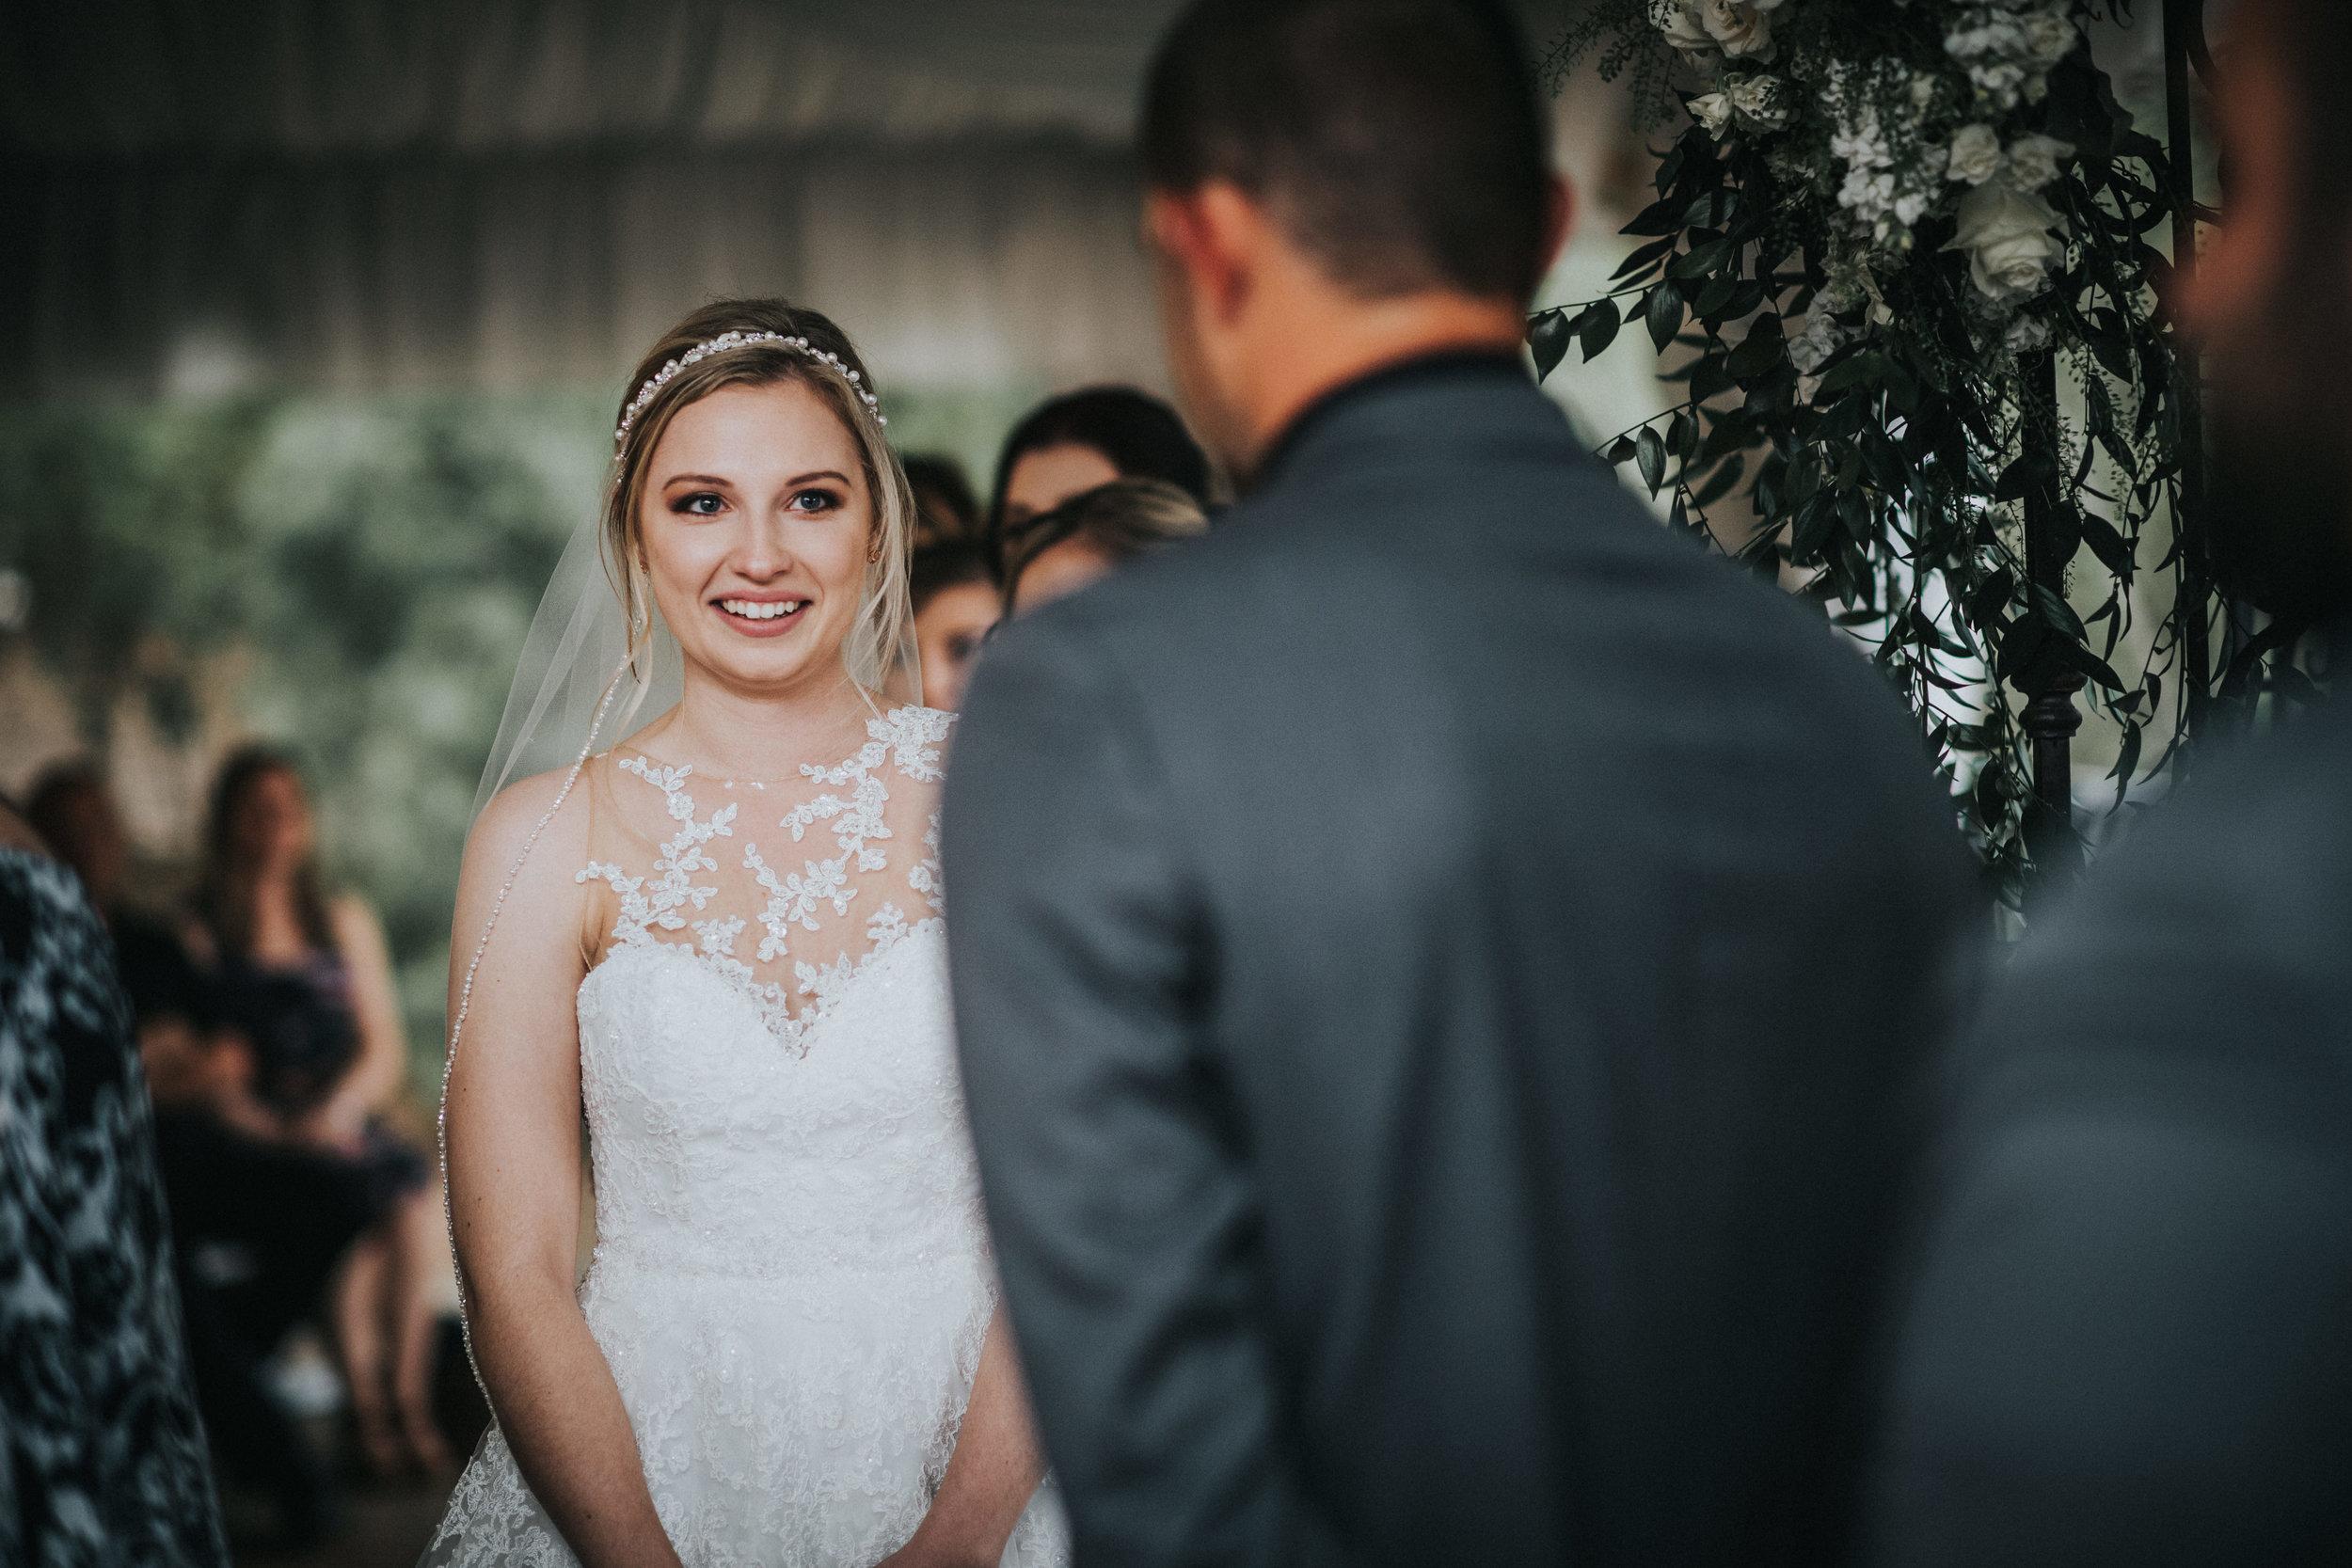 New-Jersey-Wedding-Photographer-Megan&Nick-Ceremony-106.jpg